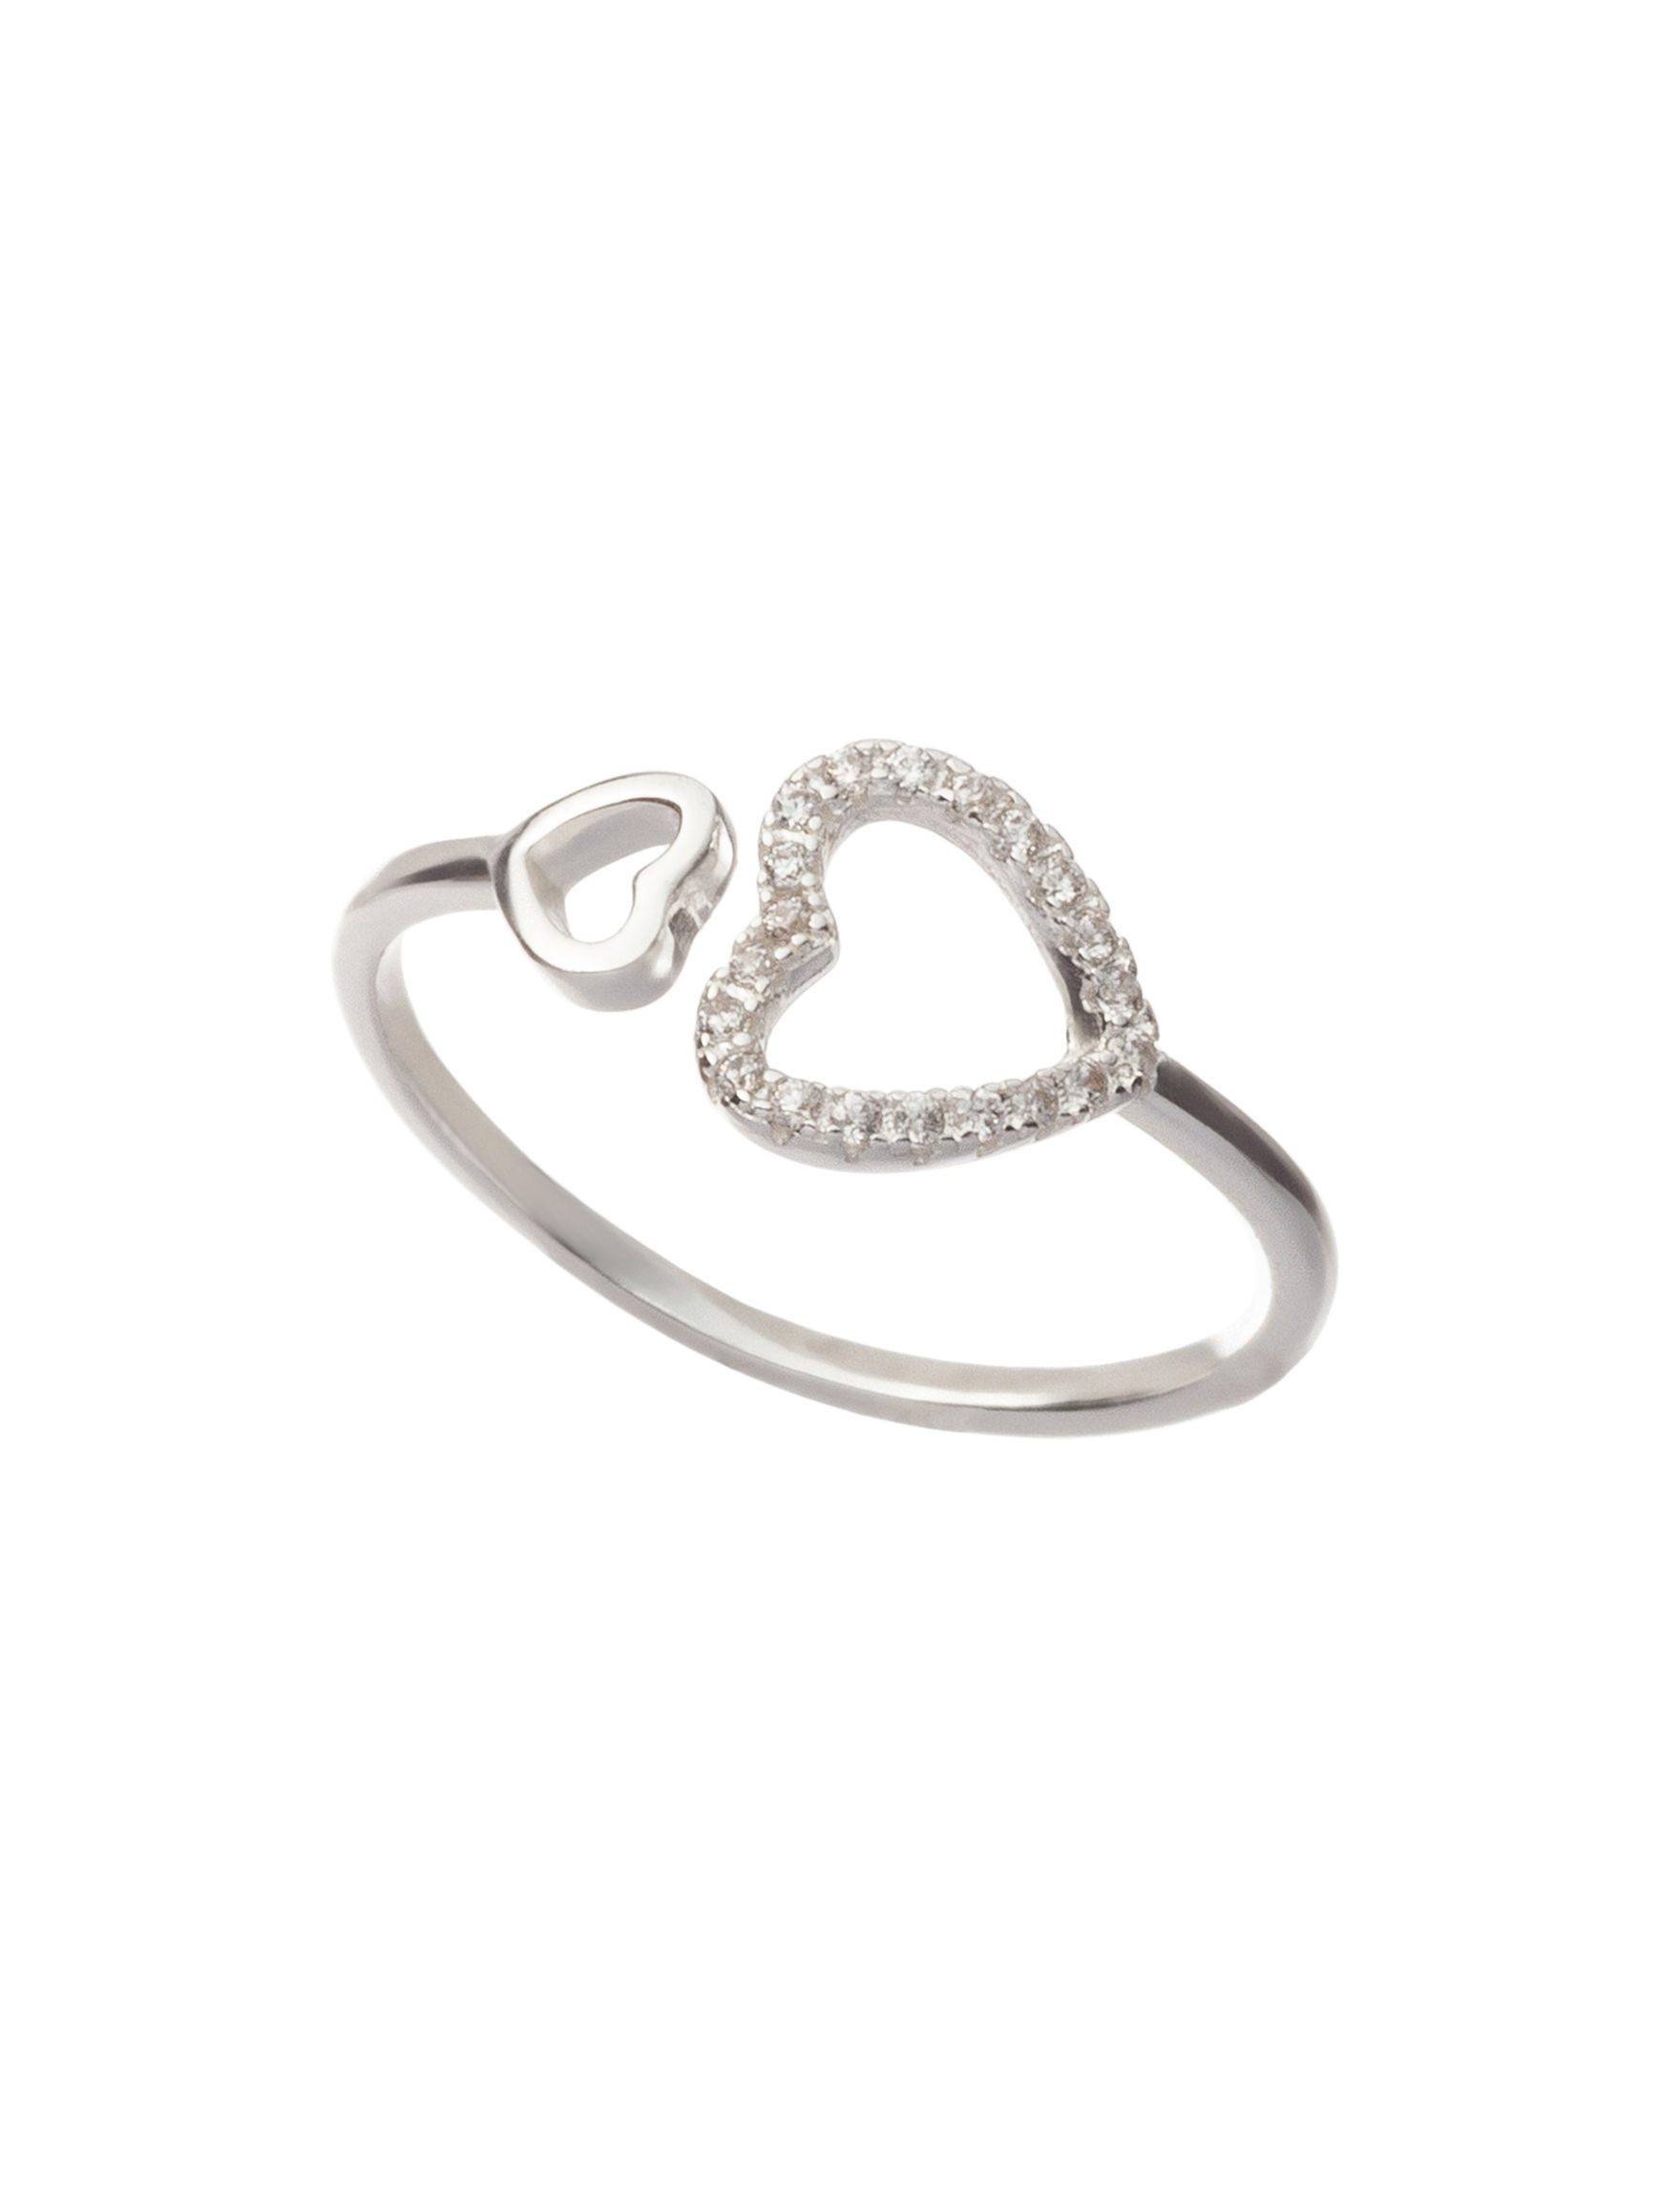 Marsala White / Silver Rings Fine Jewelry